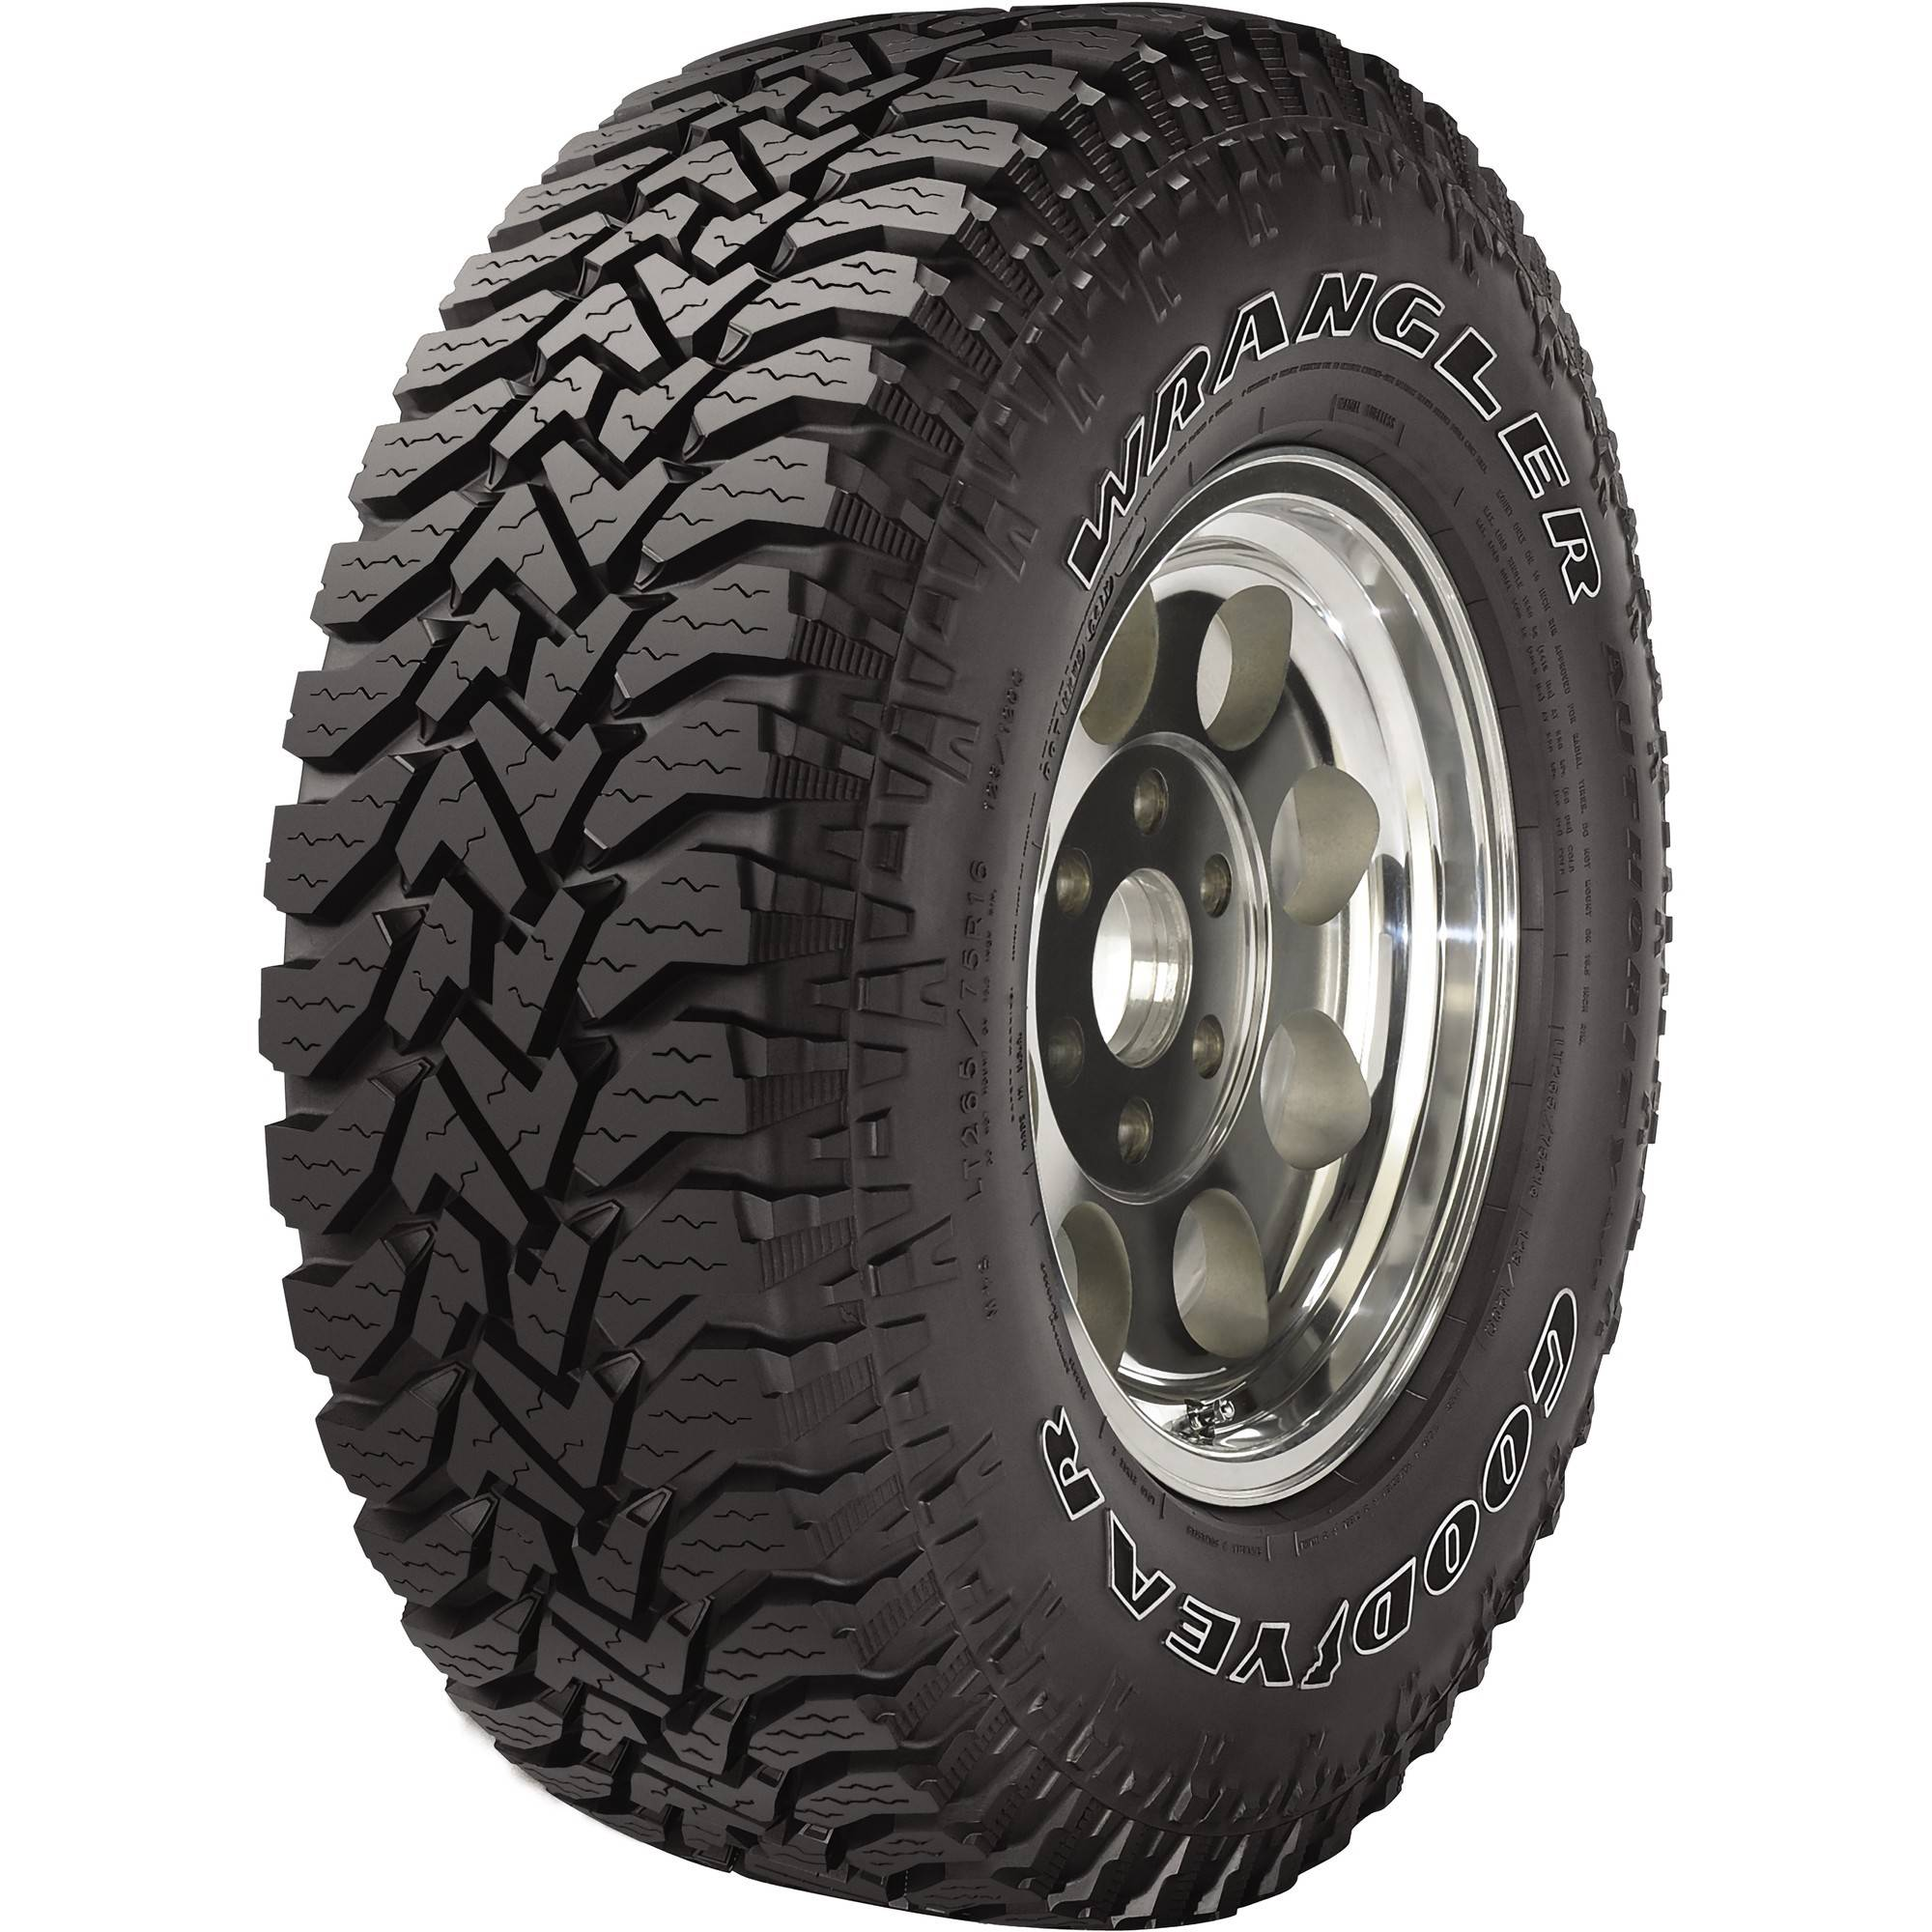 Goodyear Wrangler Authority Tire 31x10 50r15 Lt Walmart Com